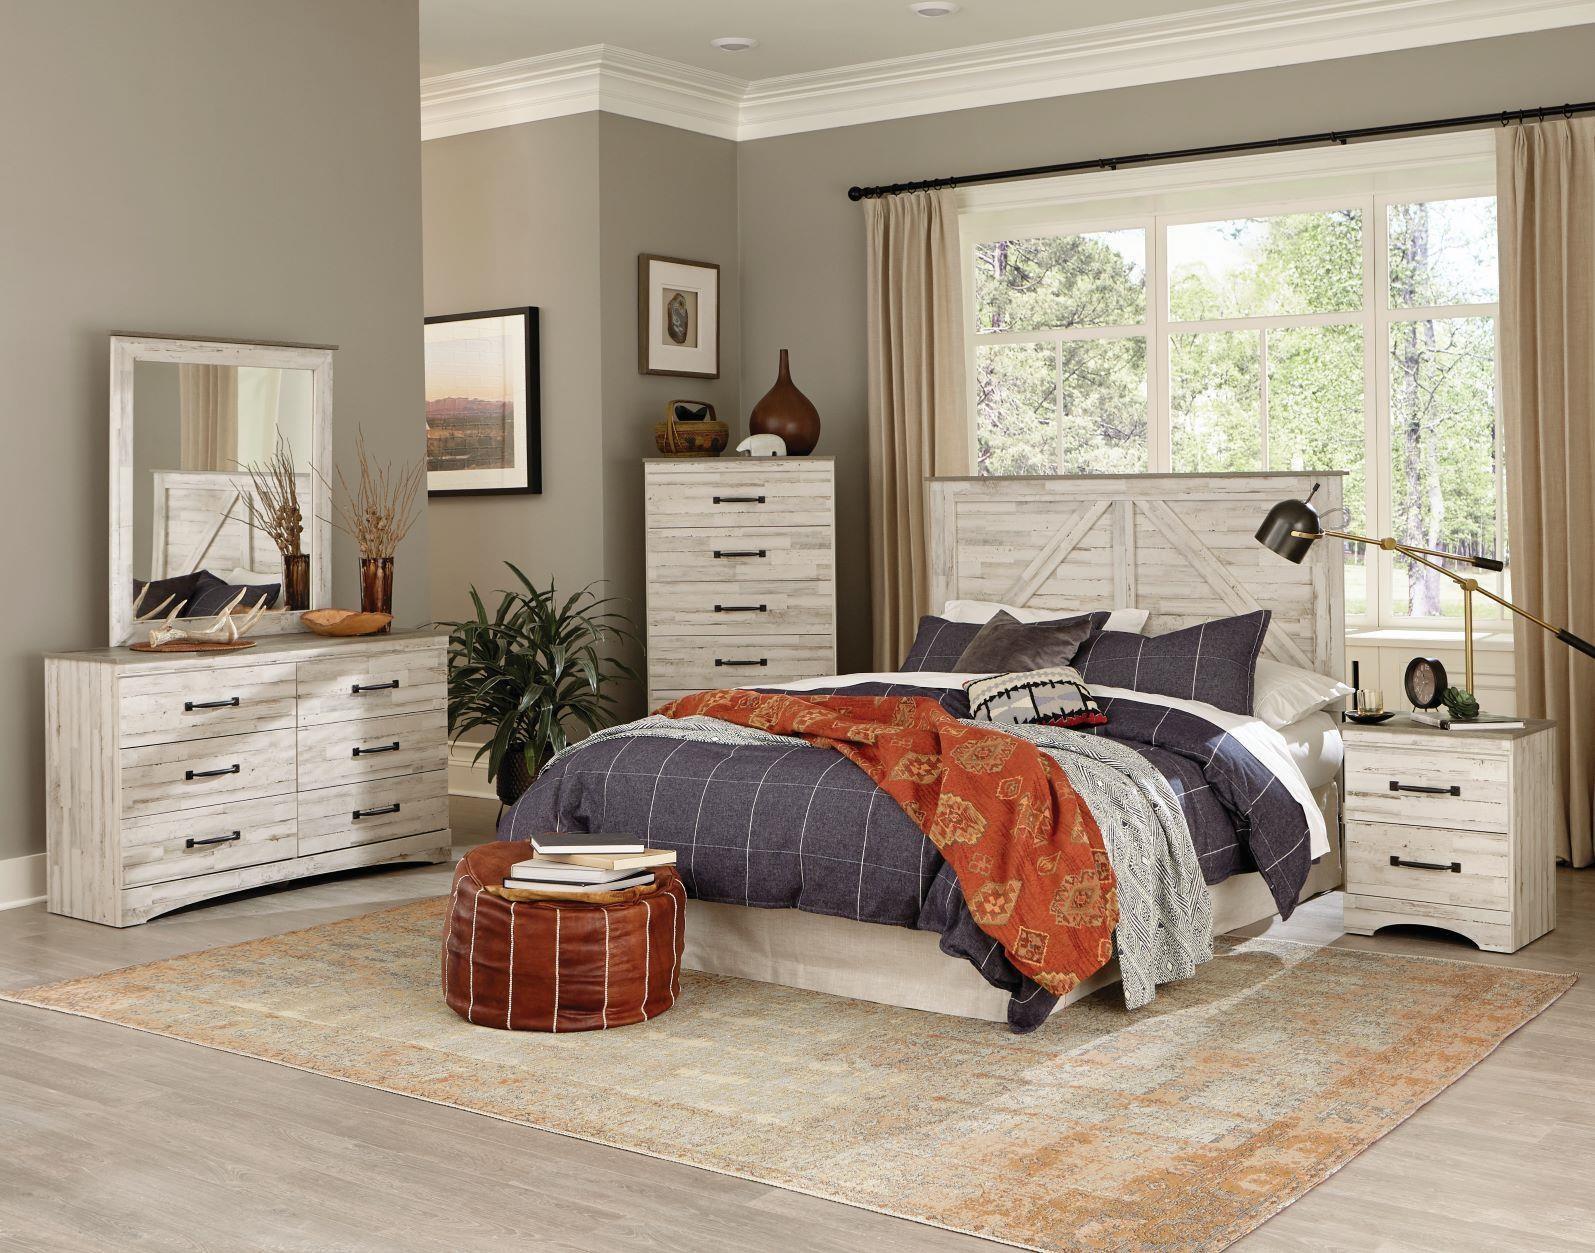 ASPEN DRESSER by Kith Furniture at Standard Furniture